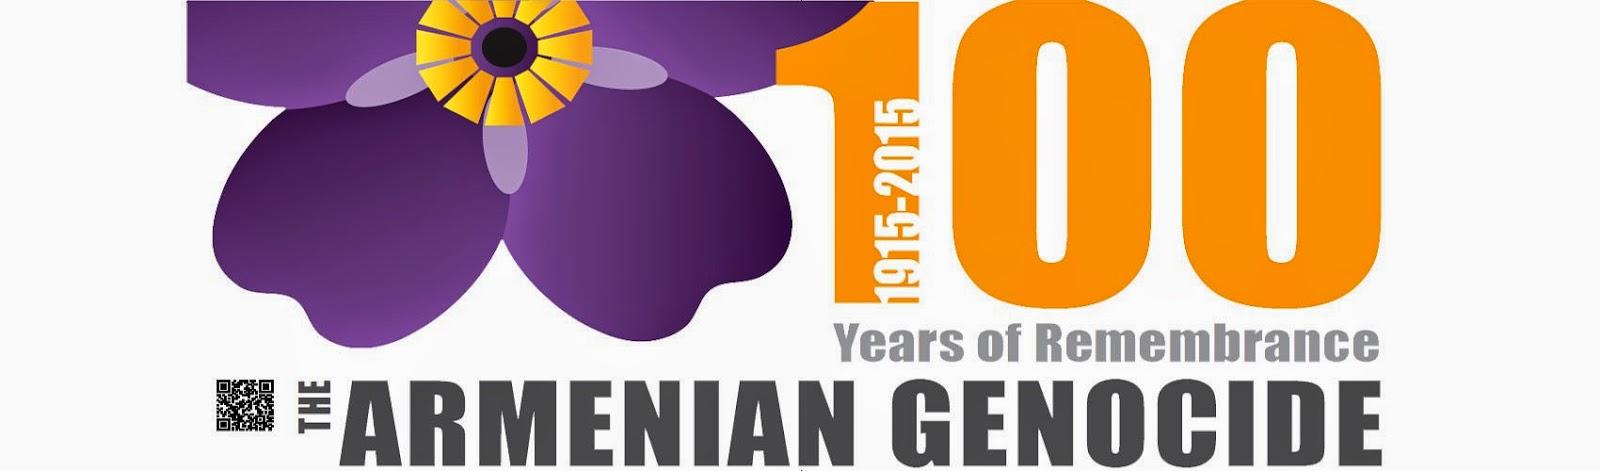 OF ARMENIAN GENOCIDE B...